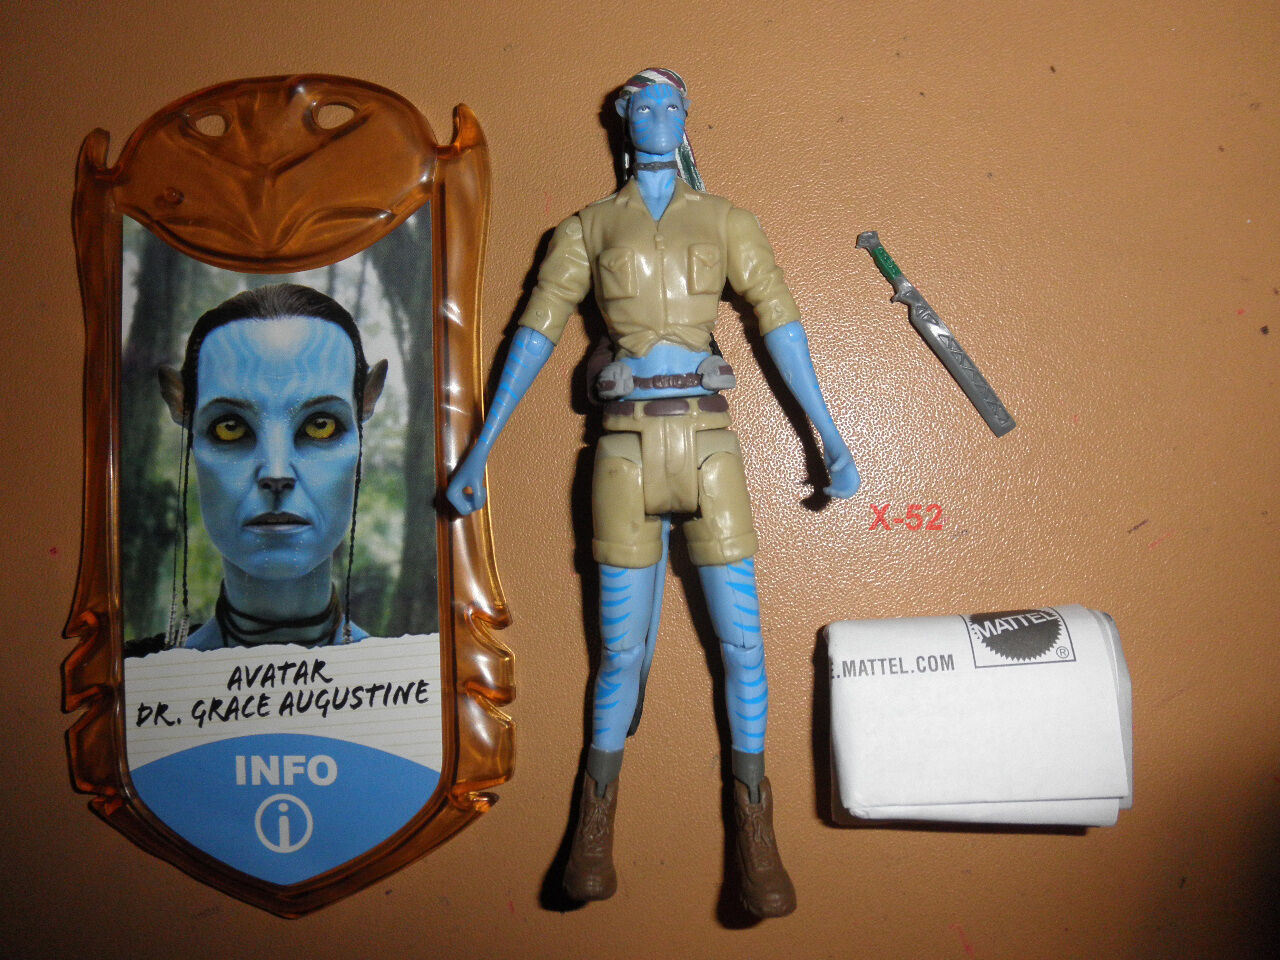 Avatar - film navi dr. grace augustine abbildung spielzeug sigourney weaver james cameron